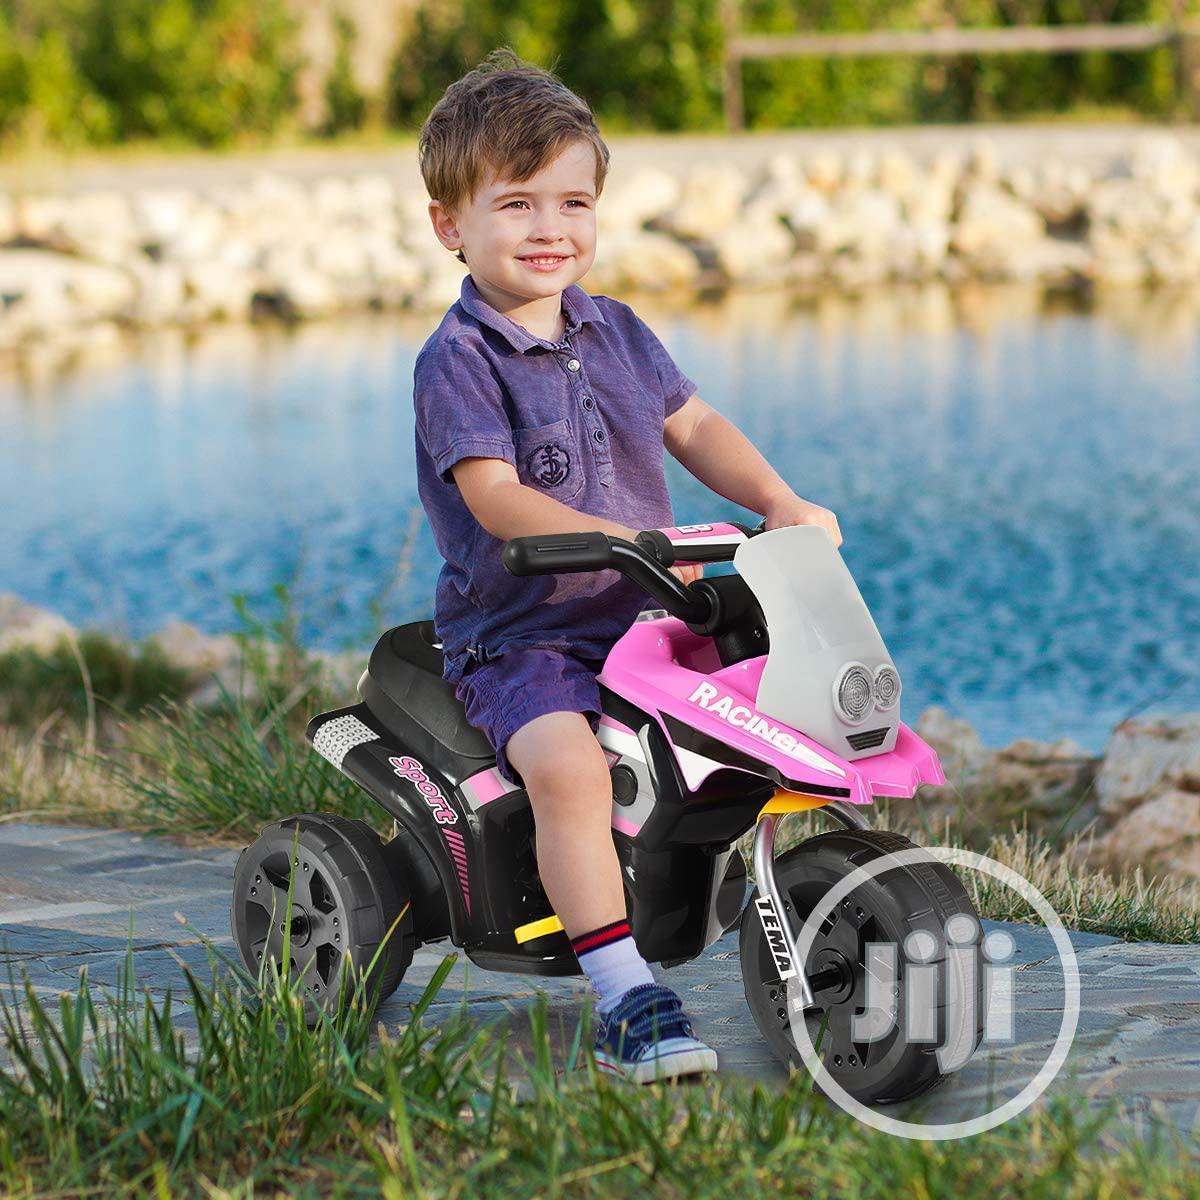 3 Wheel Mini Racing Trike for Kids - TEMA | Toys for sale in Alimosho, Lagos State, Nigeria